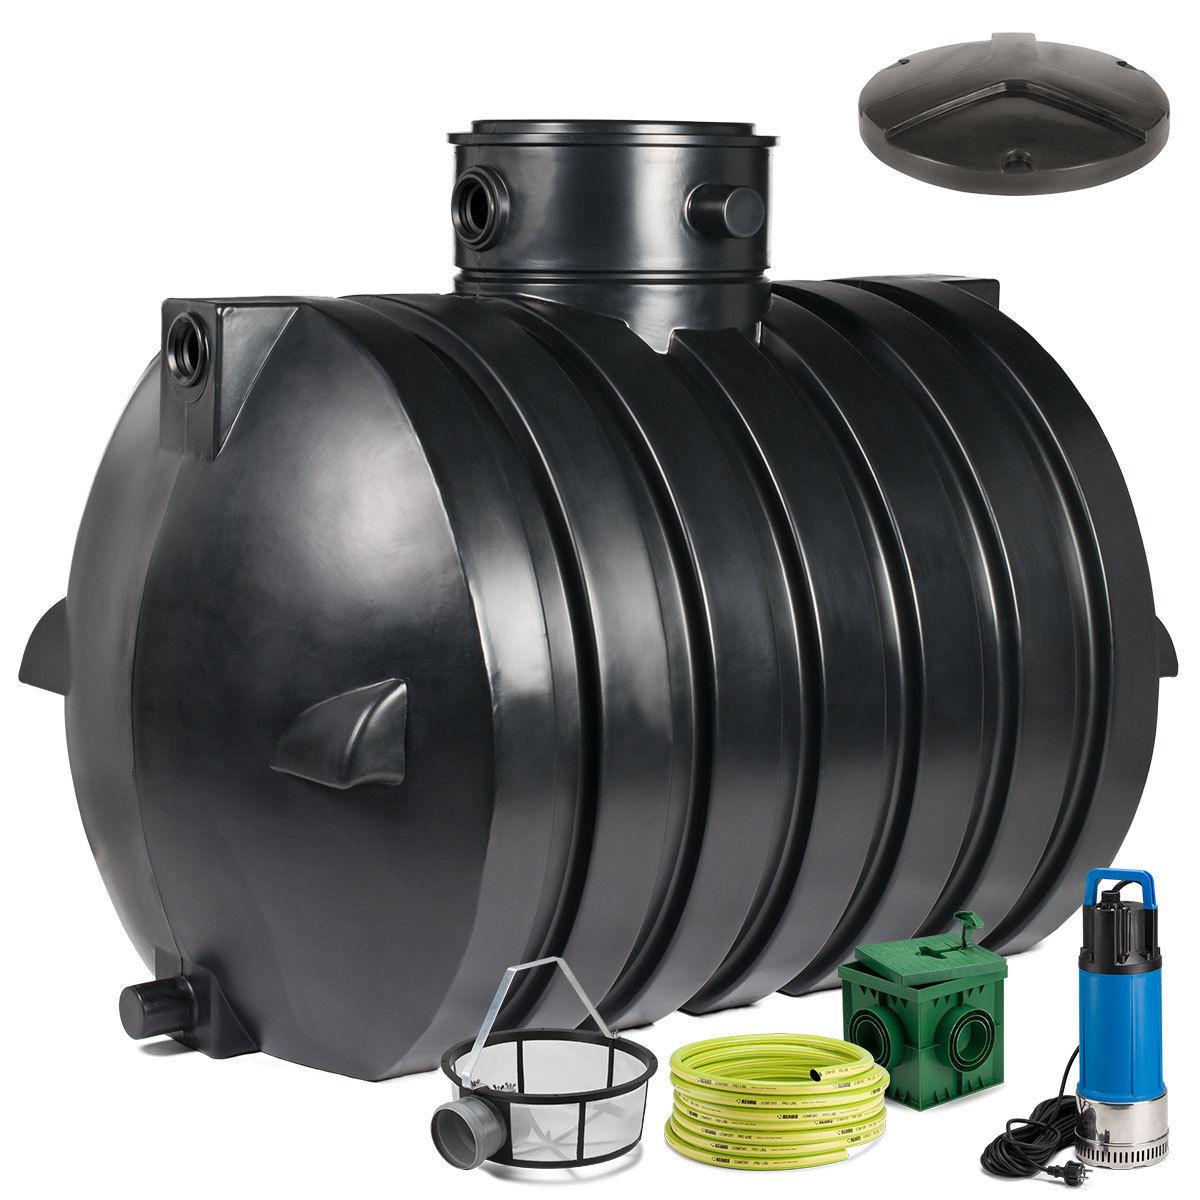 regenwassertank zisterne ozeanis 4000 l gartenanlage inkl pumpe deckel ebay. Black Bedroom Furniture Sets. Home Design Ideas